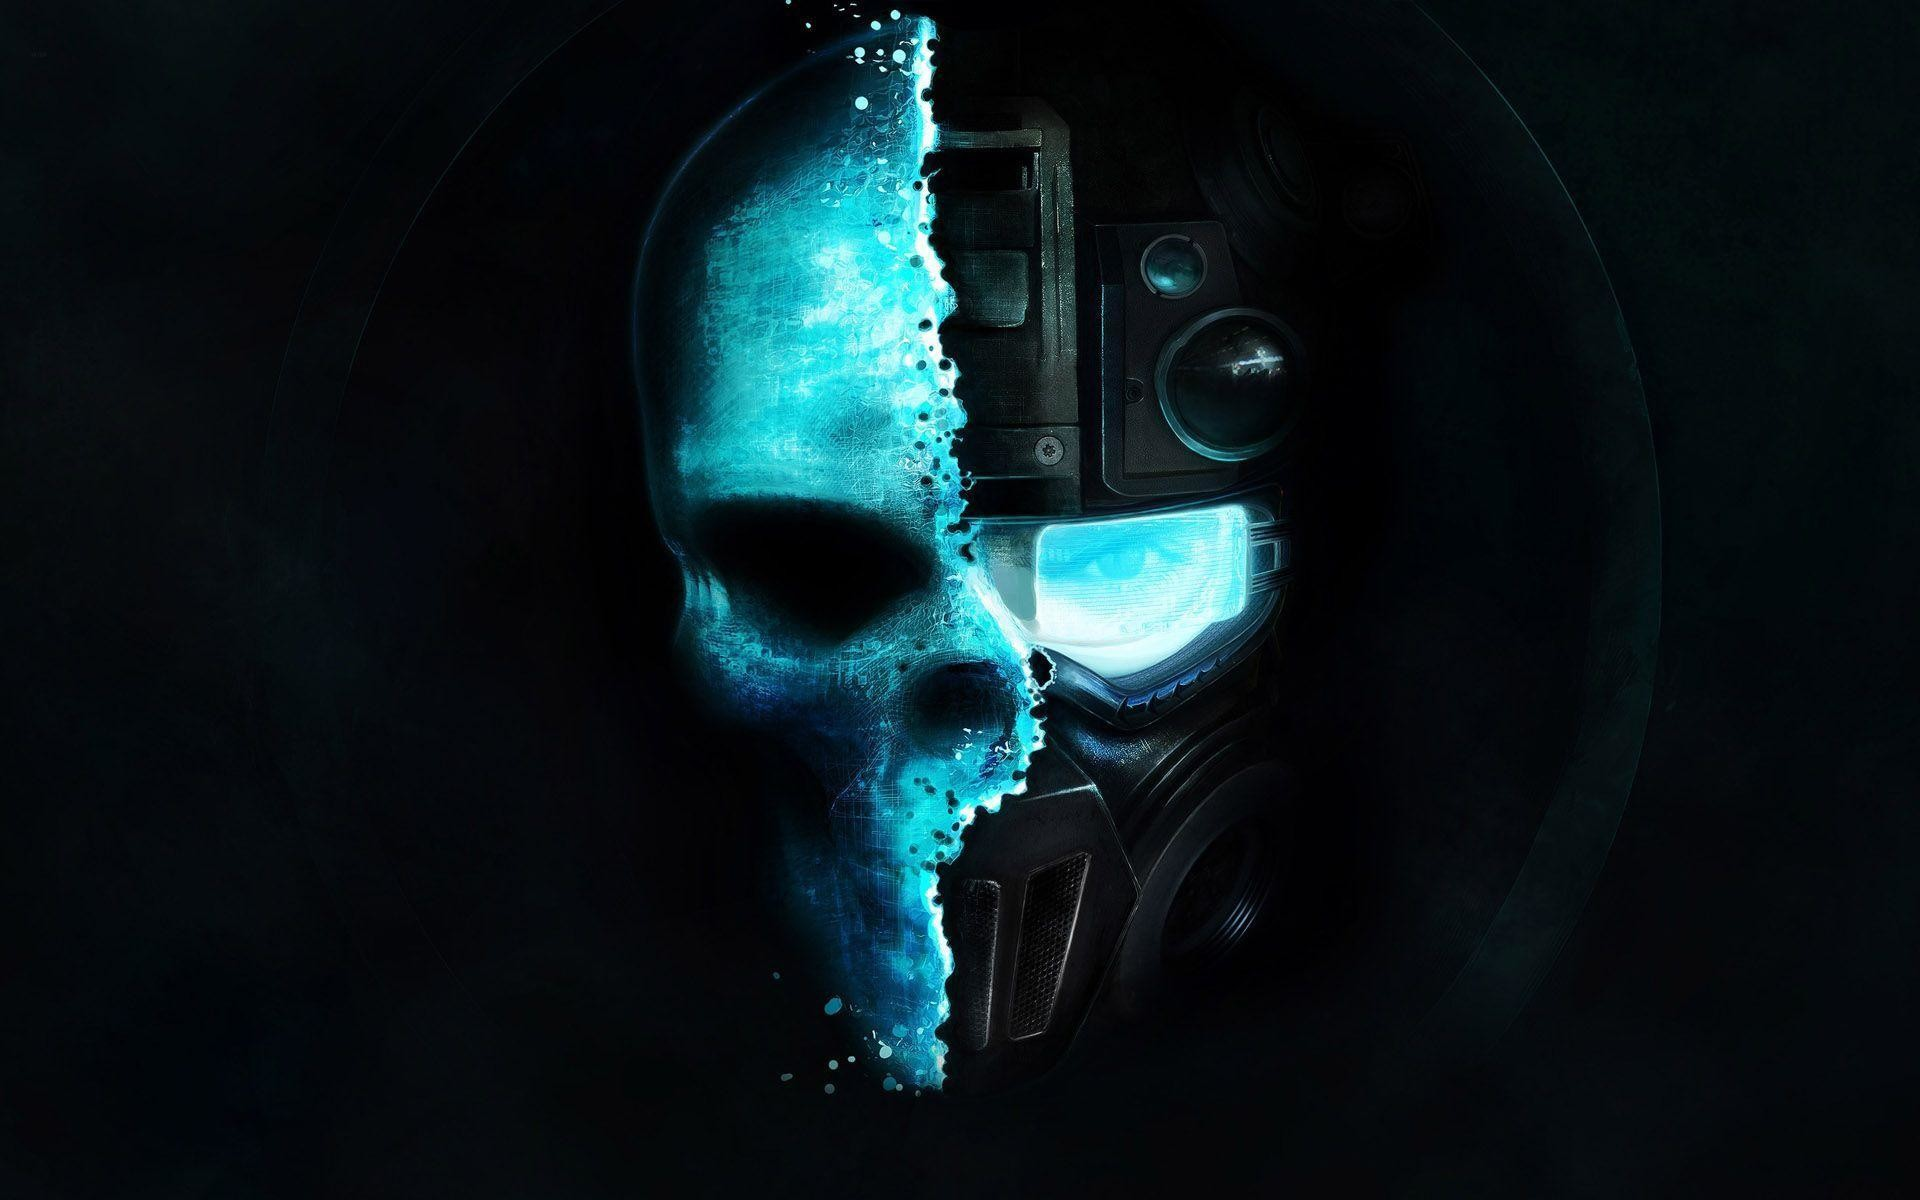 Skull Wallpapers – Full HD wallpaper search